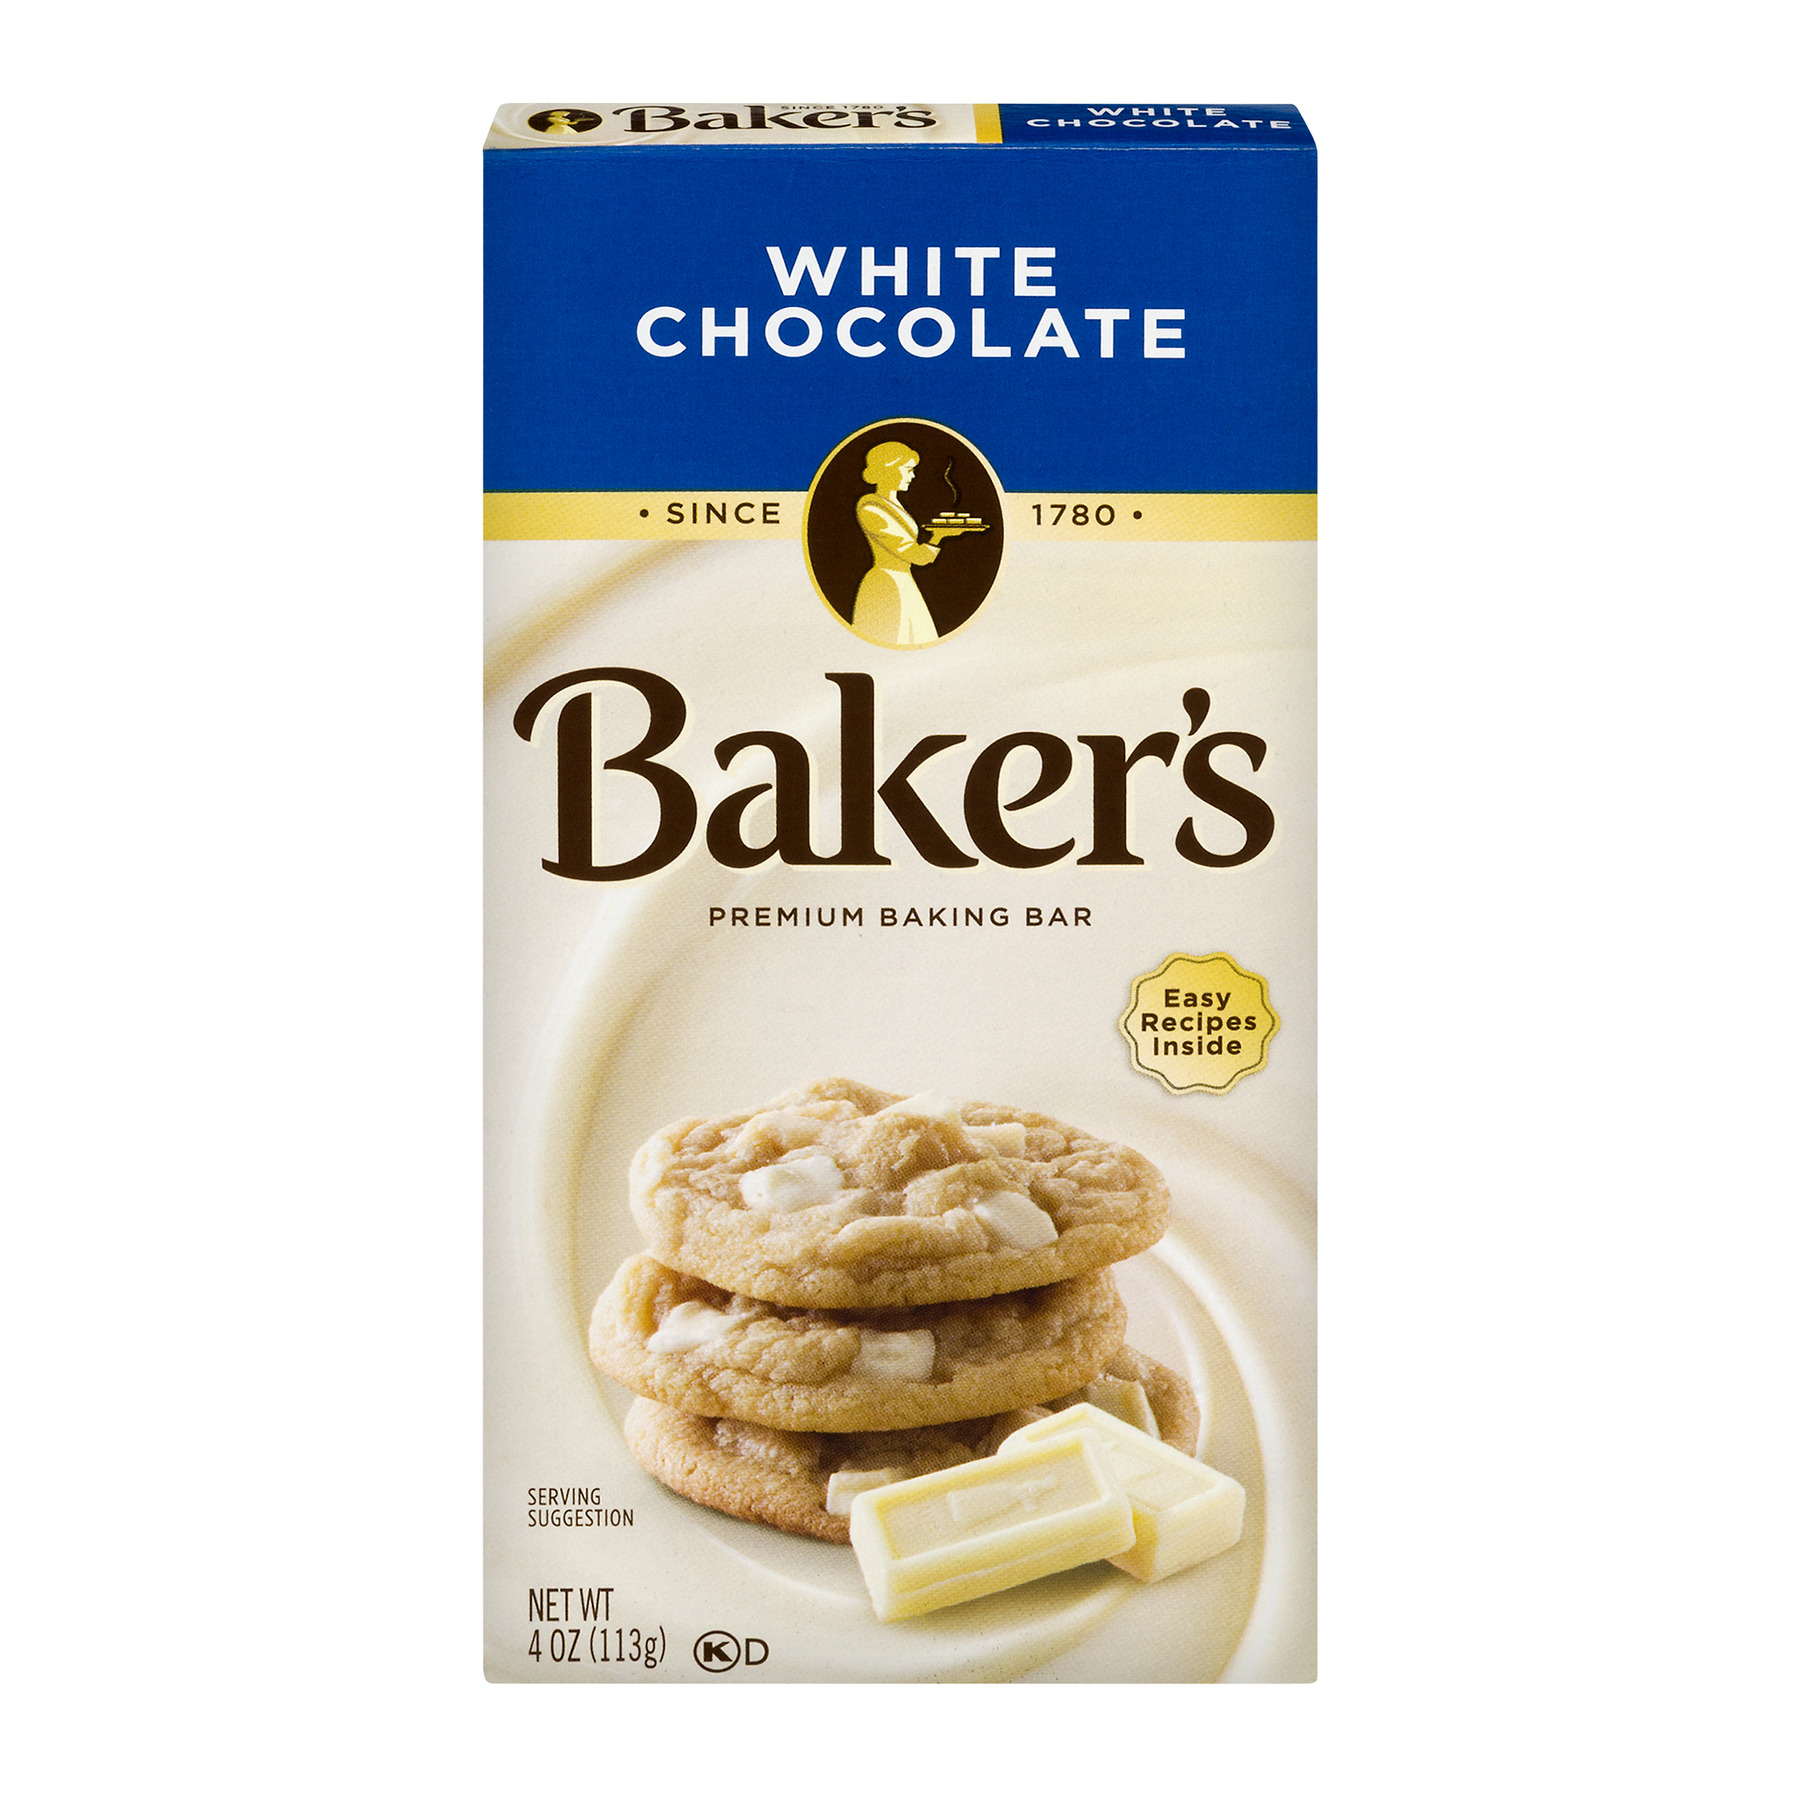 Baker's Premium White Chocolate Baking Chocolate Bar, 4 Oz by Kraft Heinz Foods Company